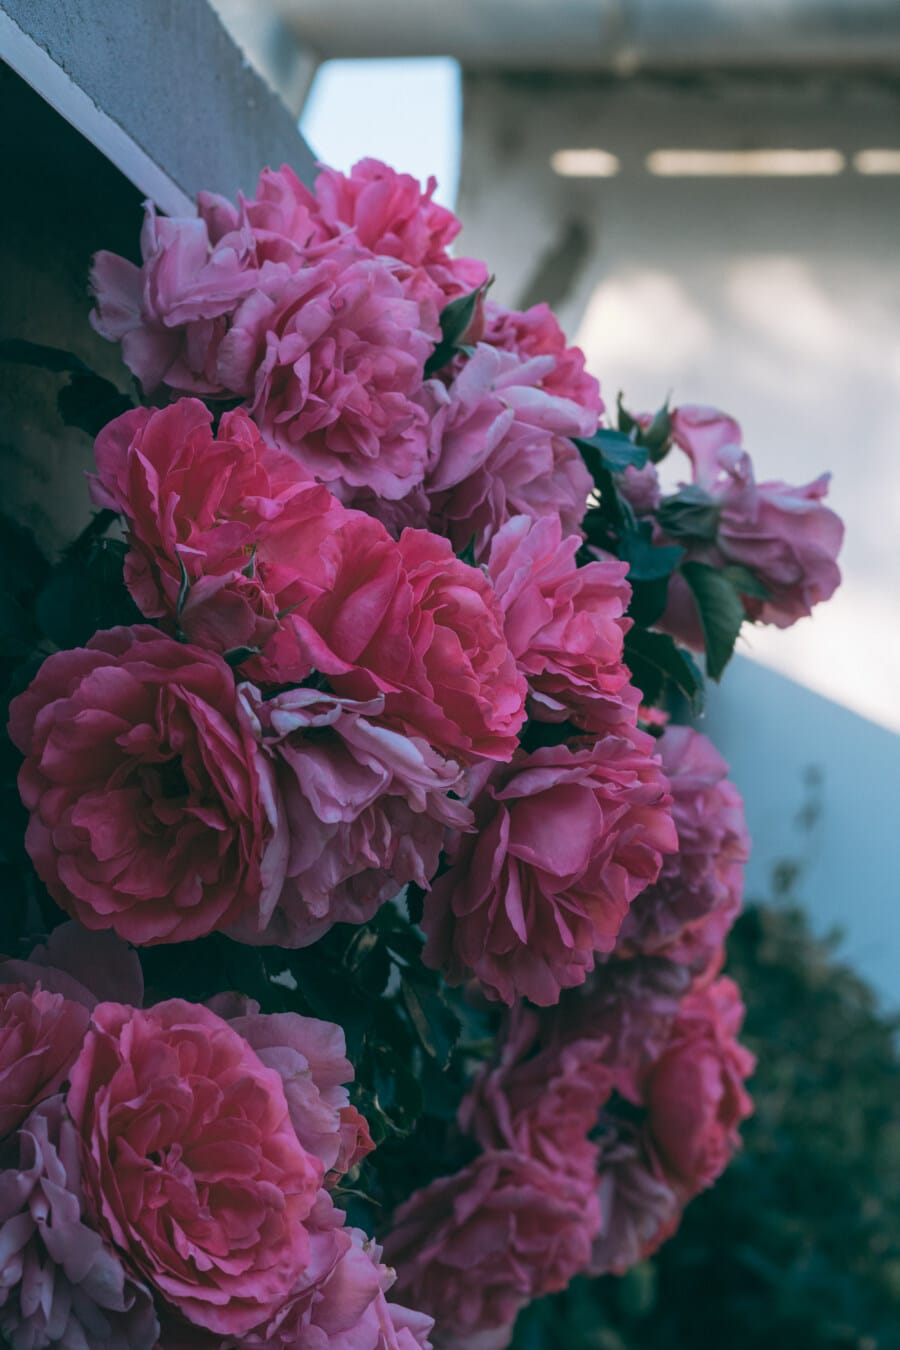 Rosen, Rosa, Balkon, Buchse, Flora, Garten, Blatt, Rosa, stieg, Blume